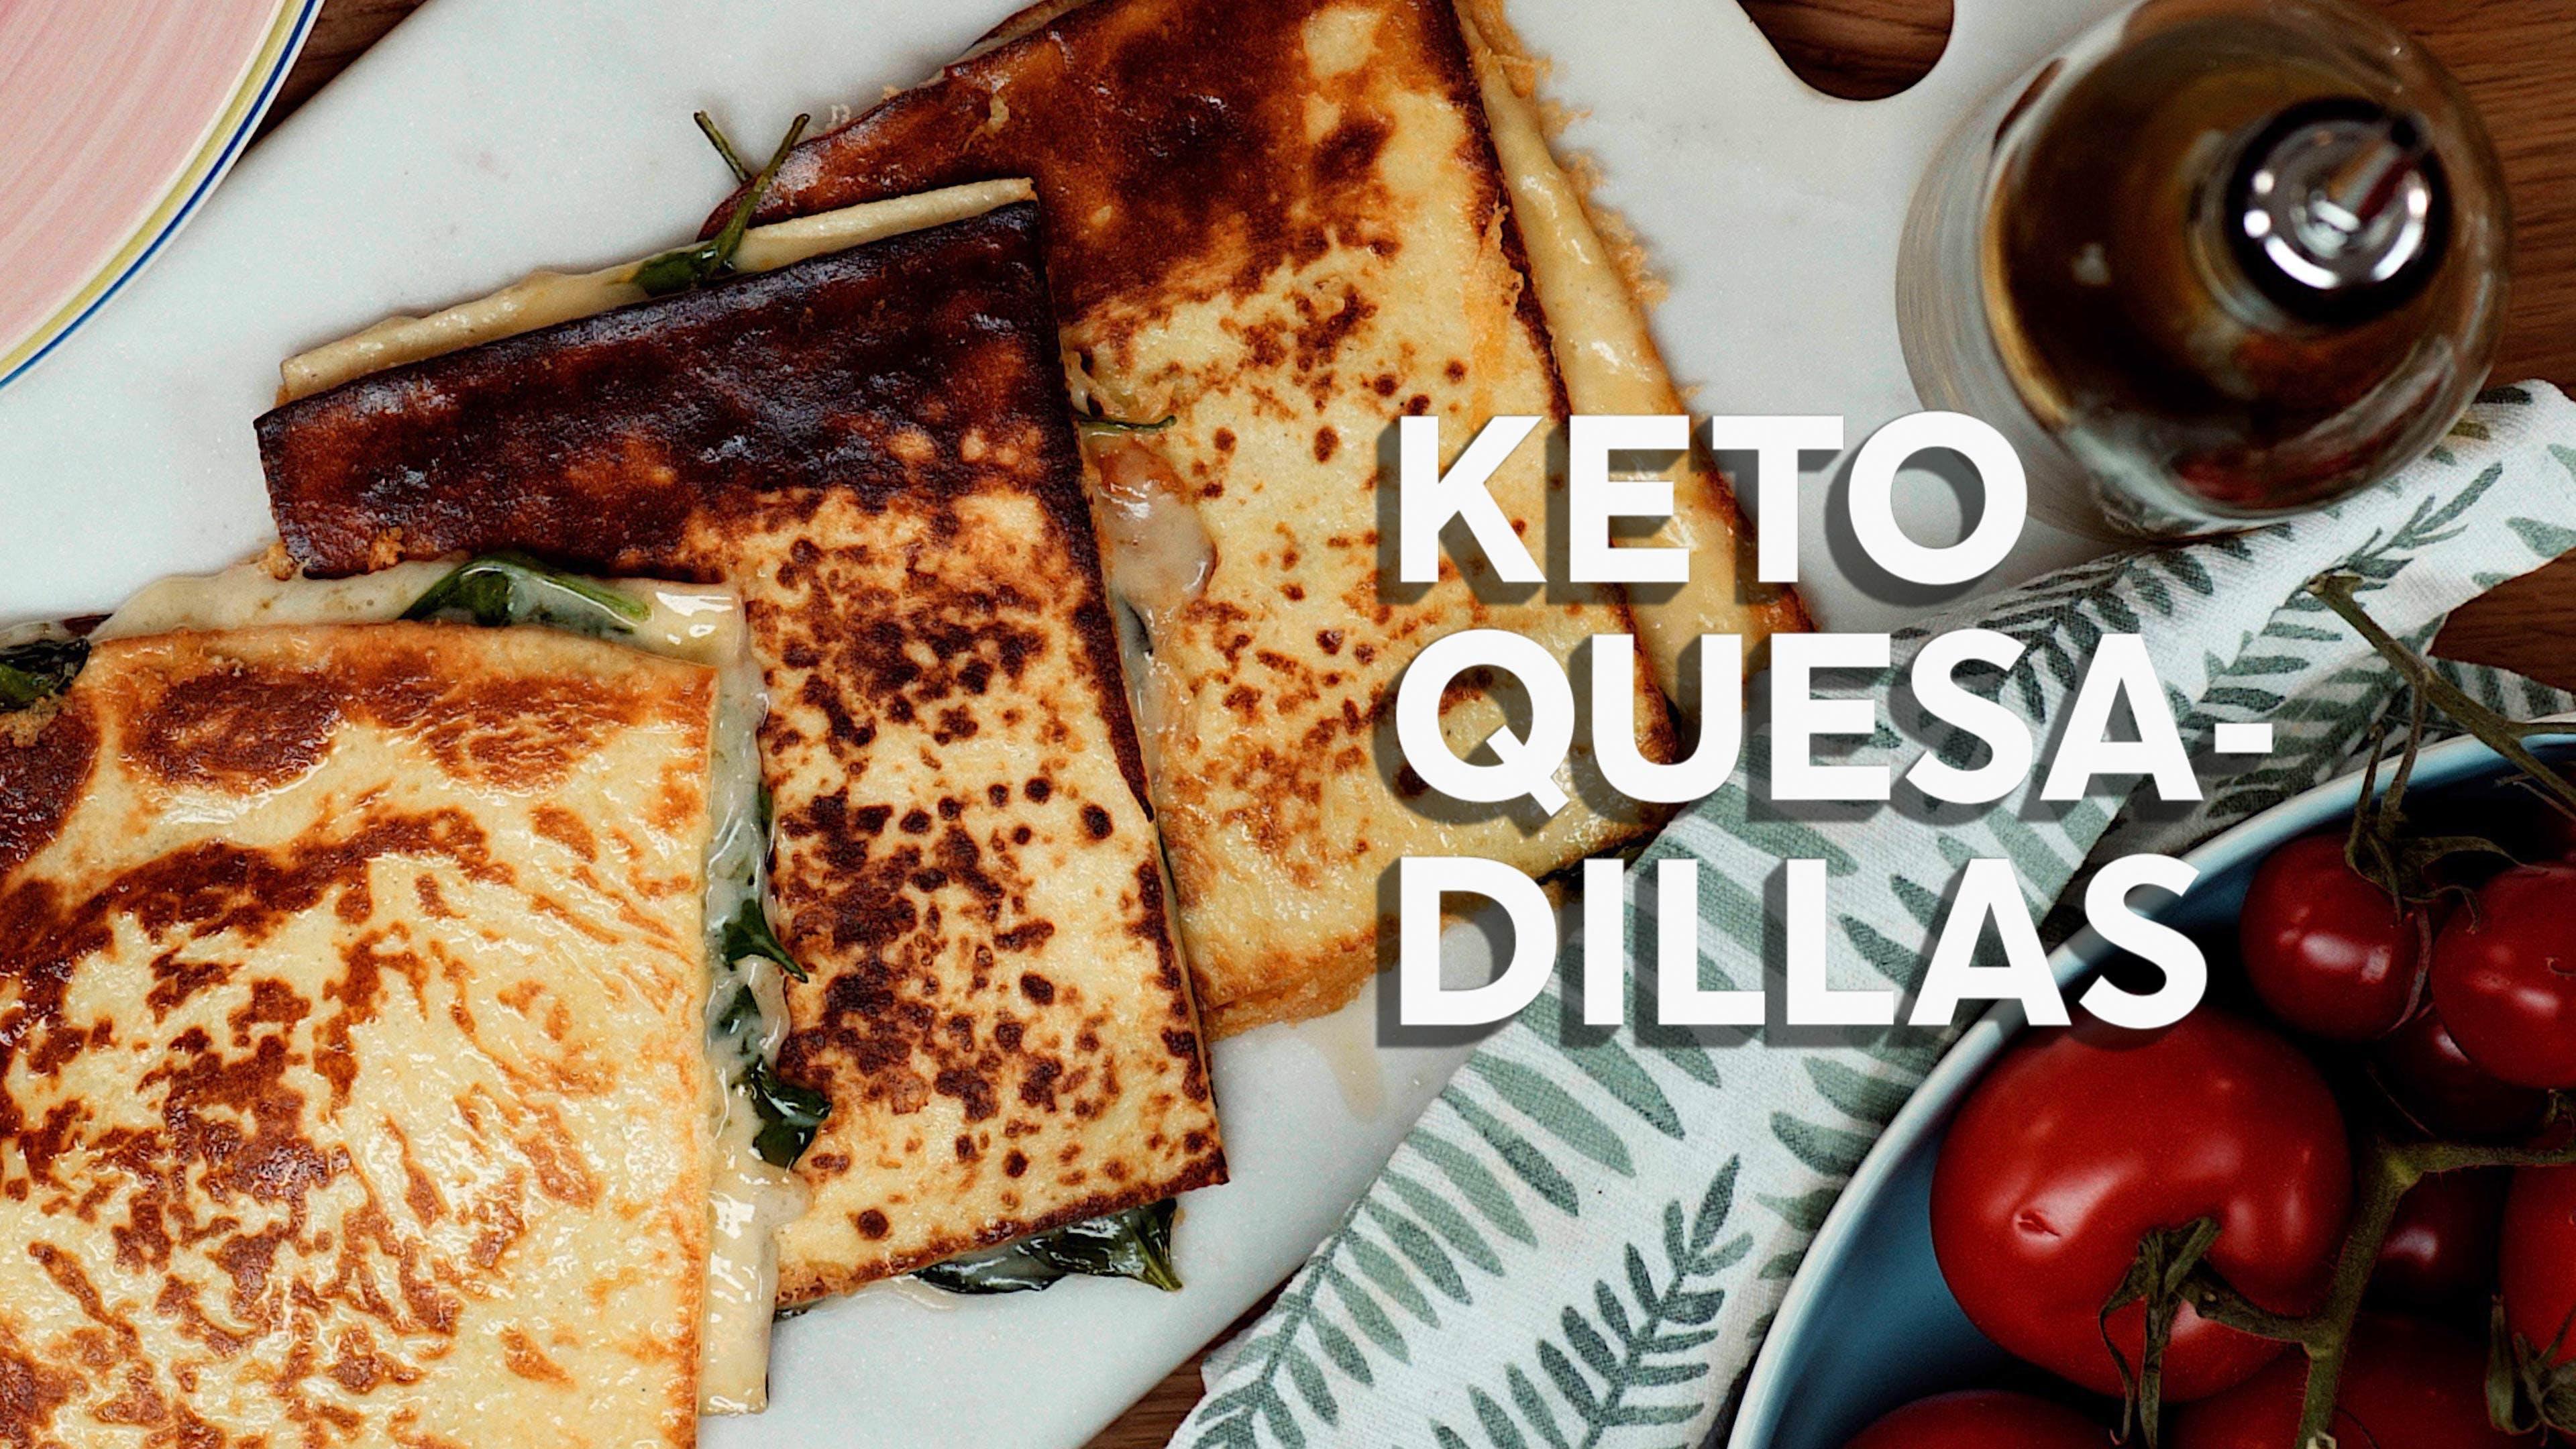 How to make keto quesadillas